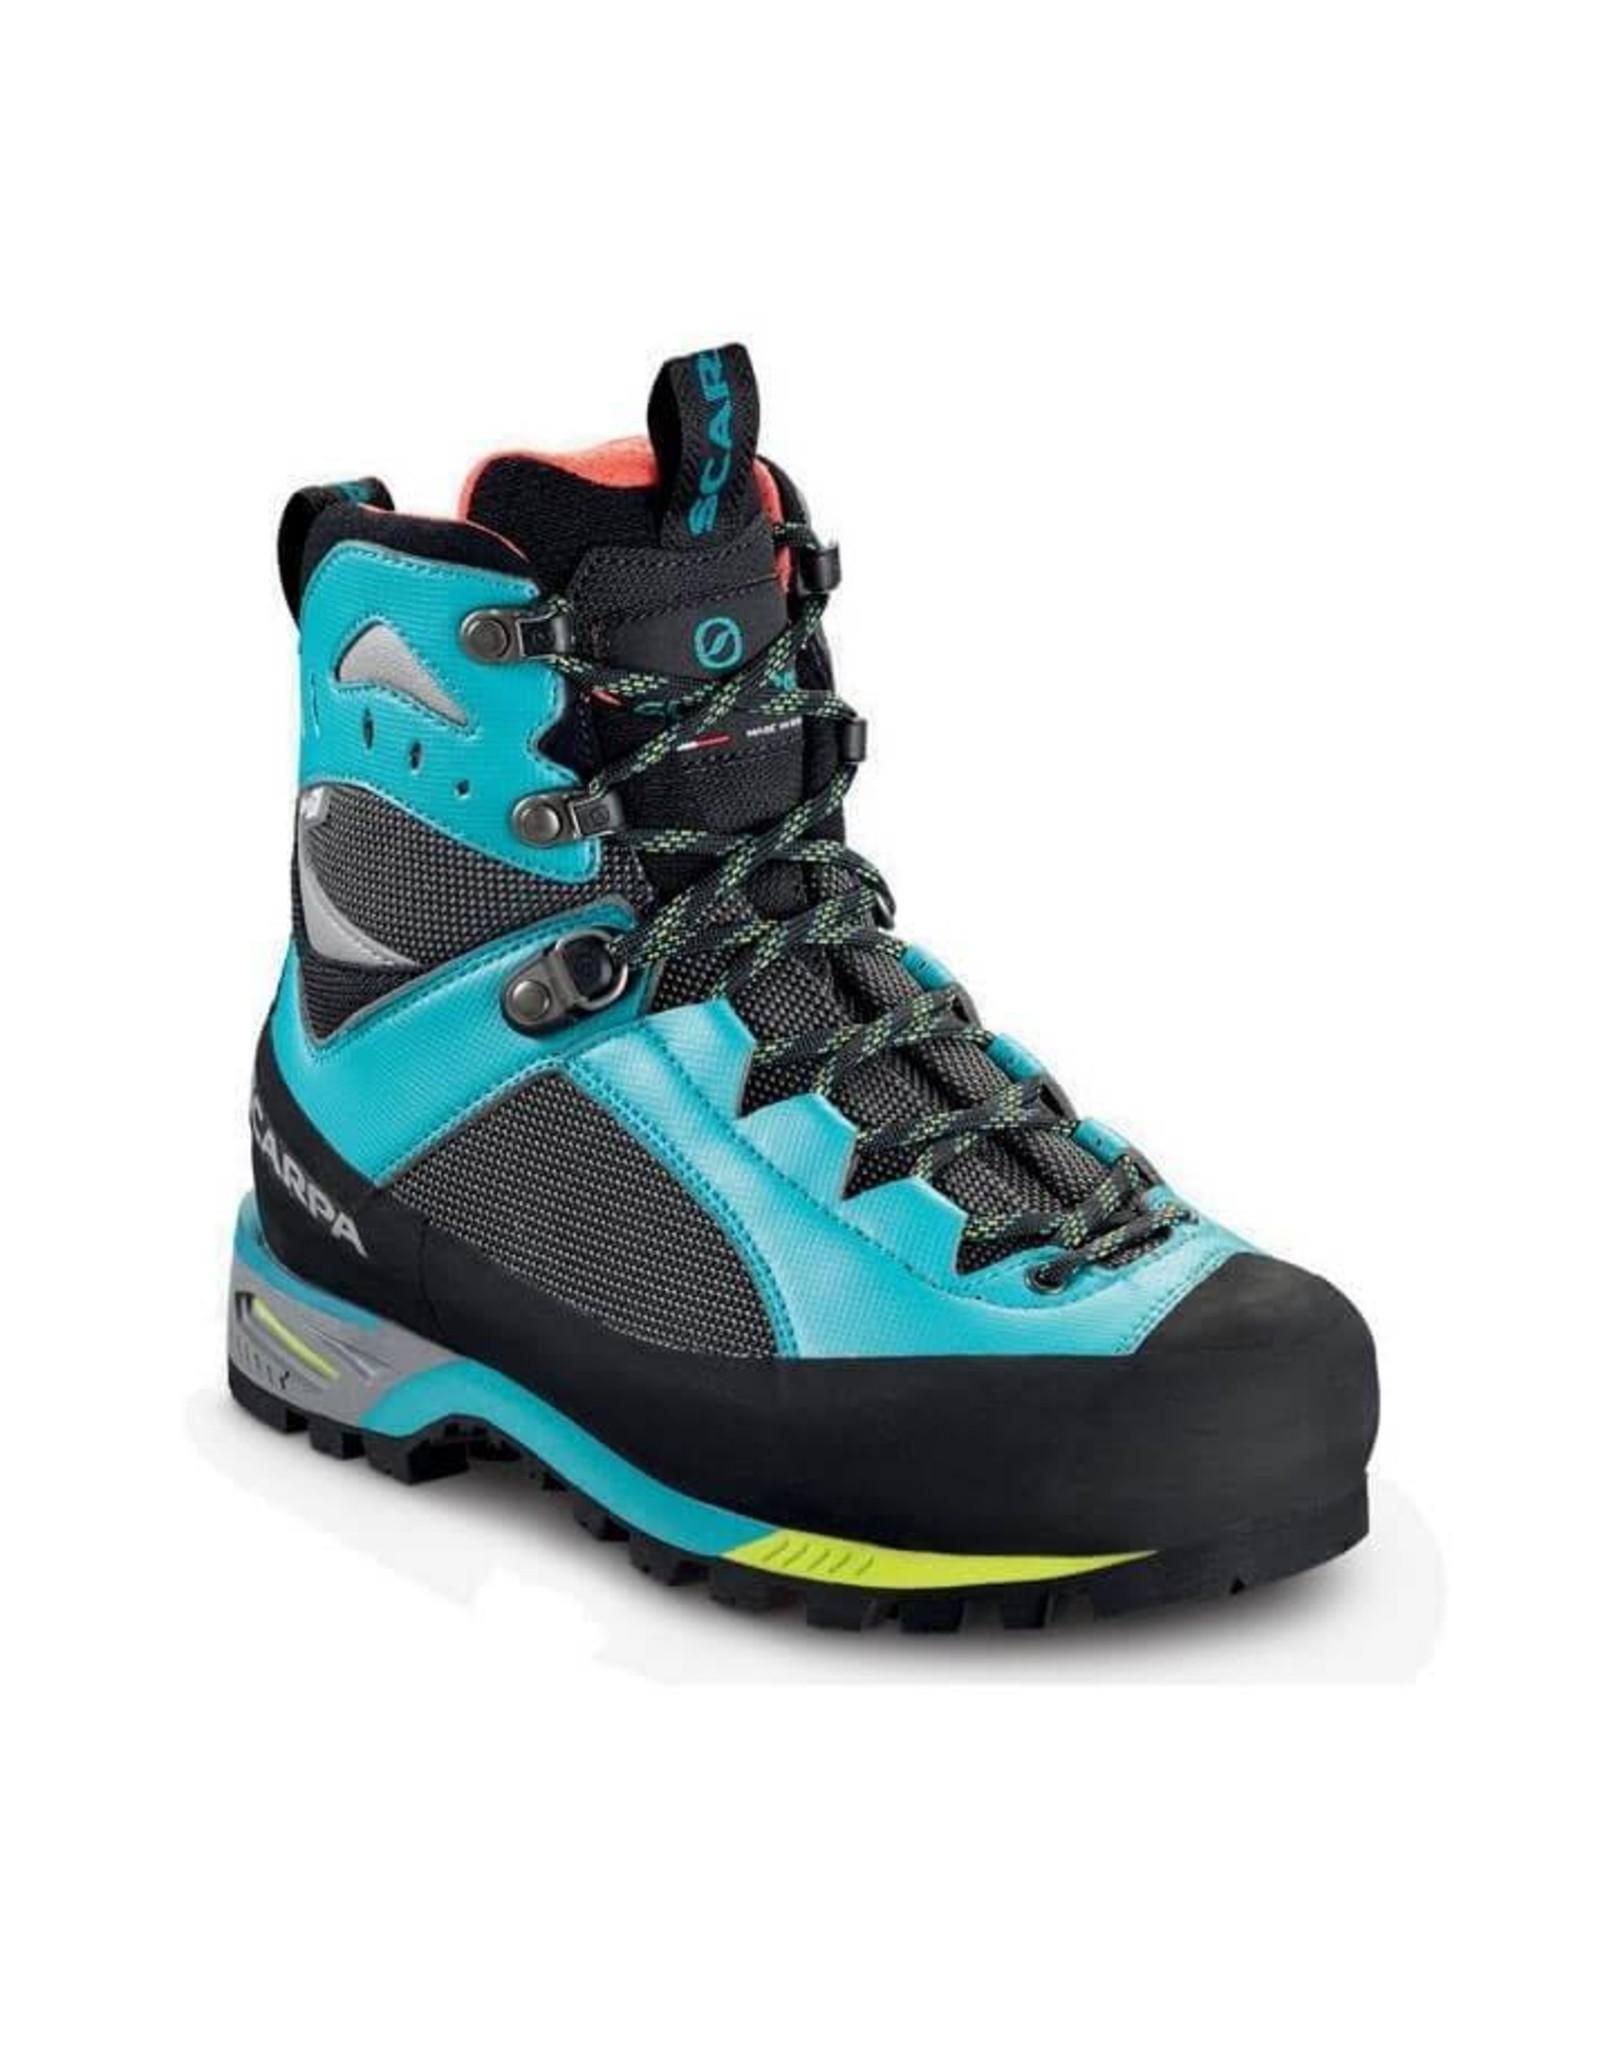 Scarpa Scarpa Charmoz Women's Mountaineering Boot